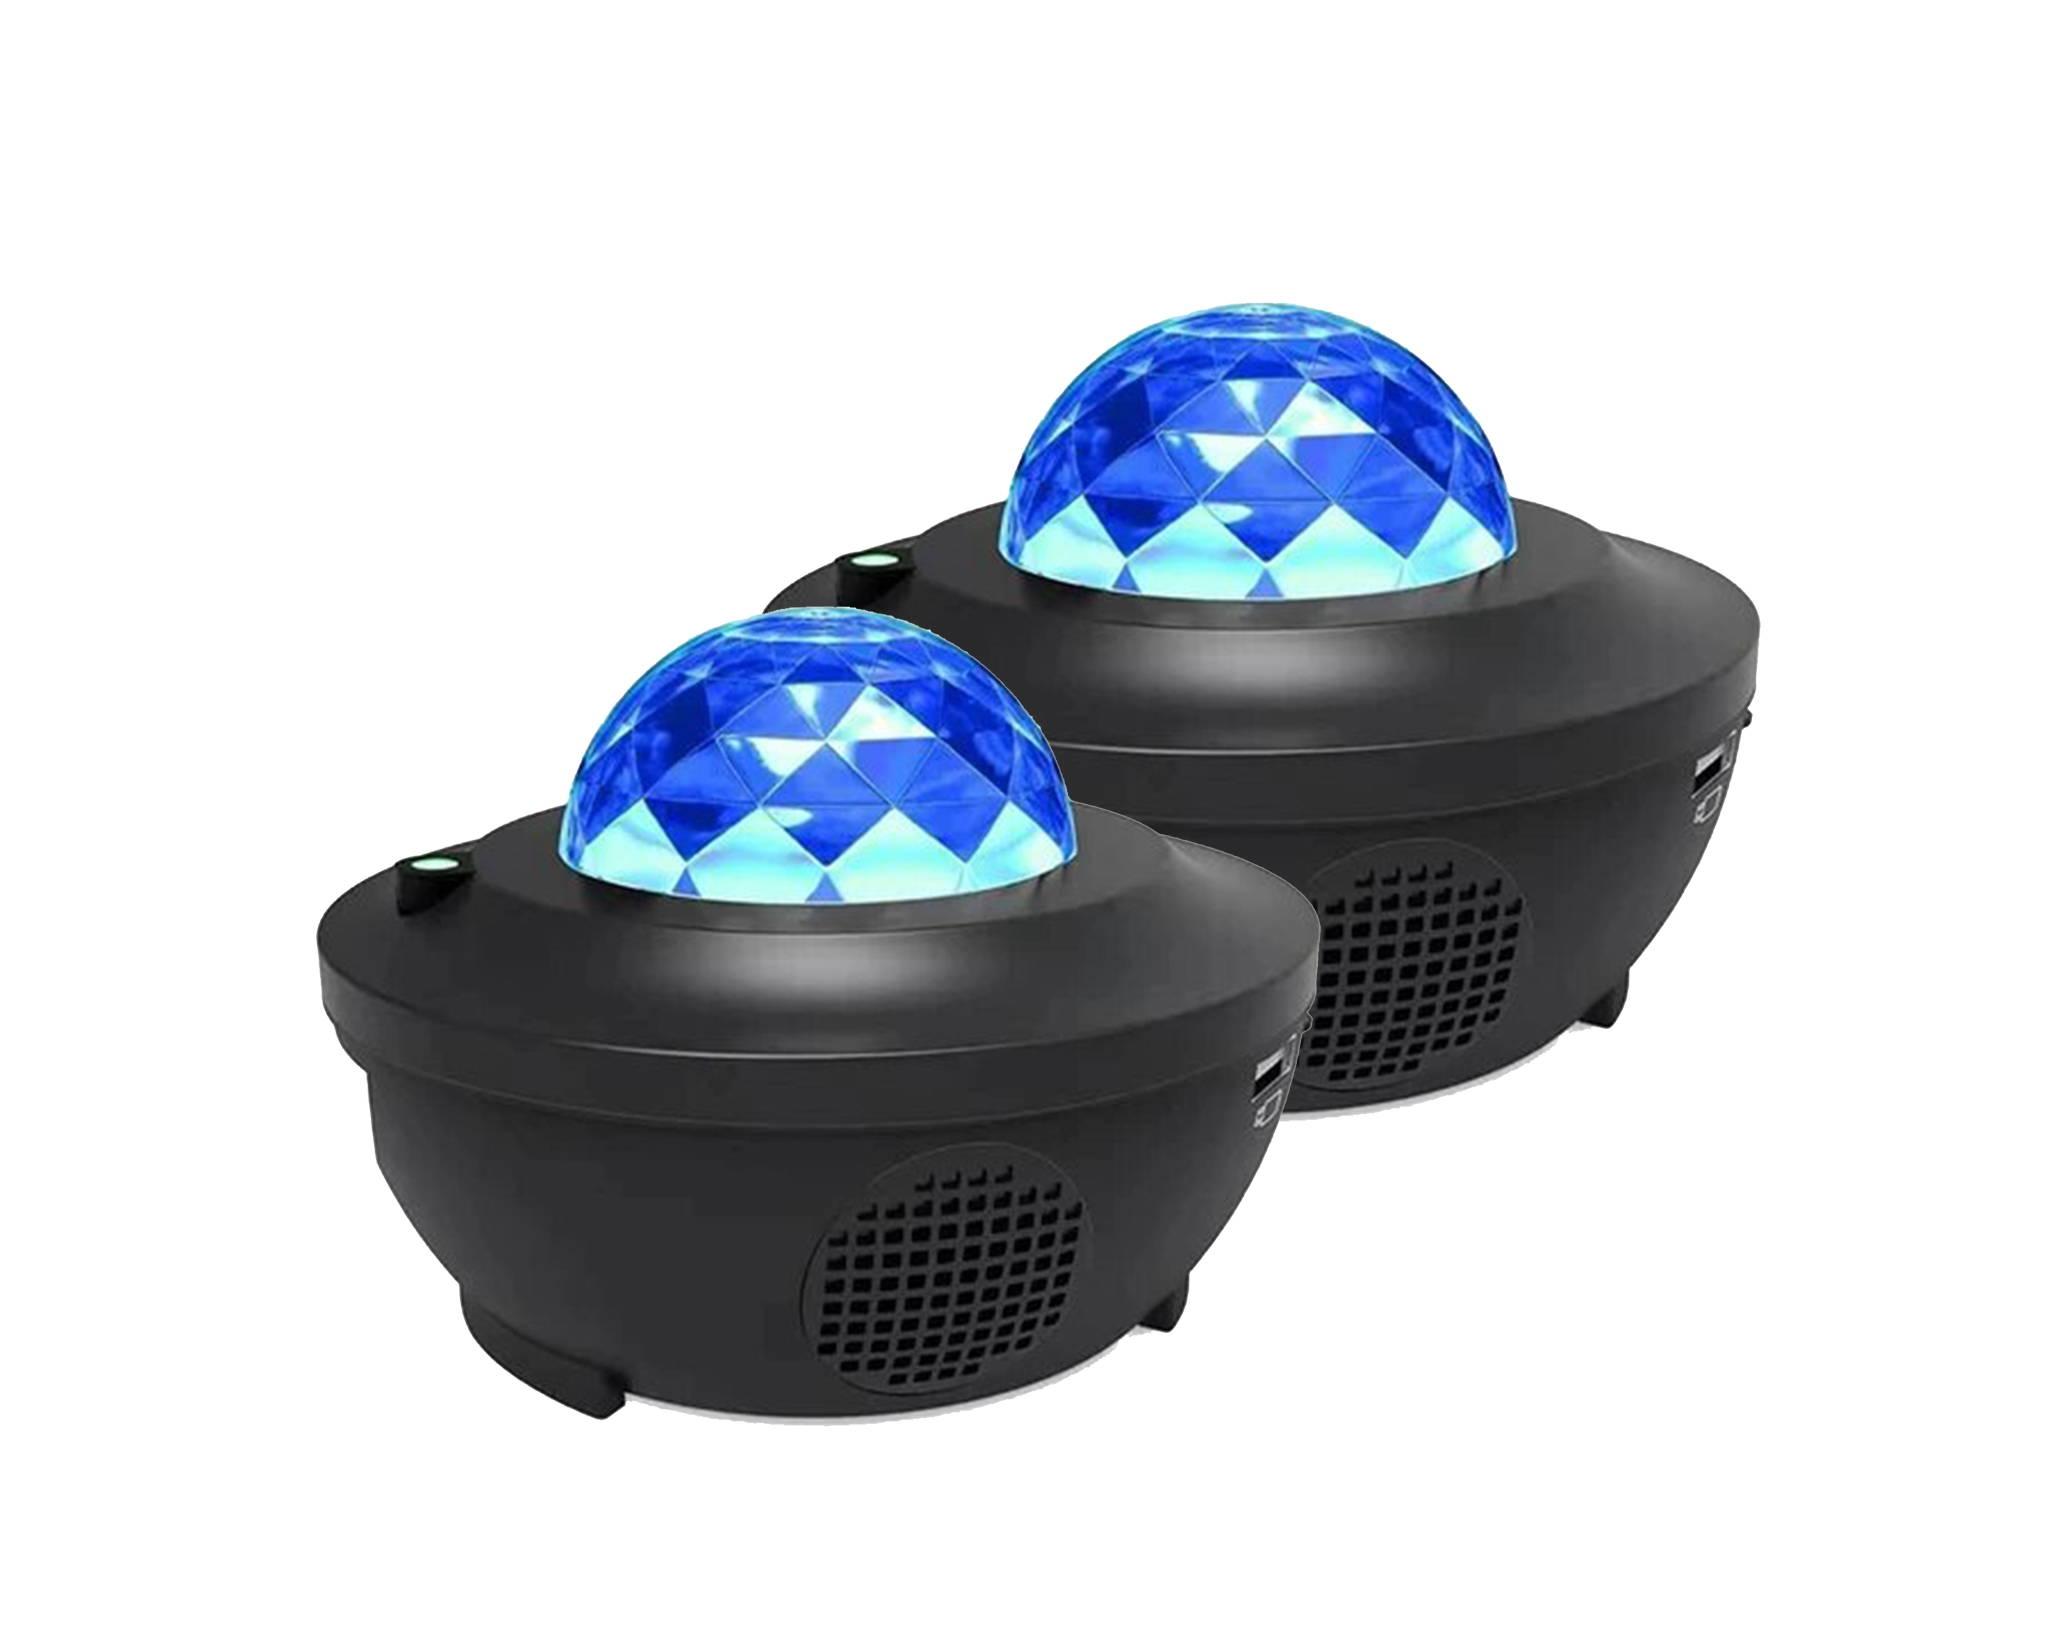 skylight projector, blue star projector, tiktok starry night projector